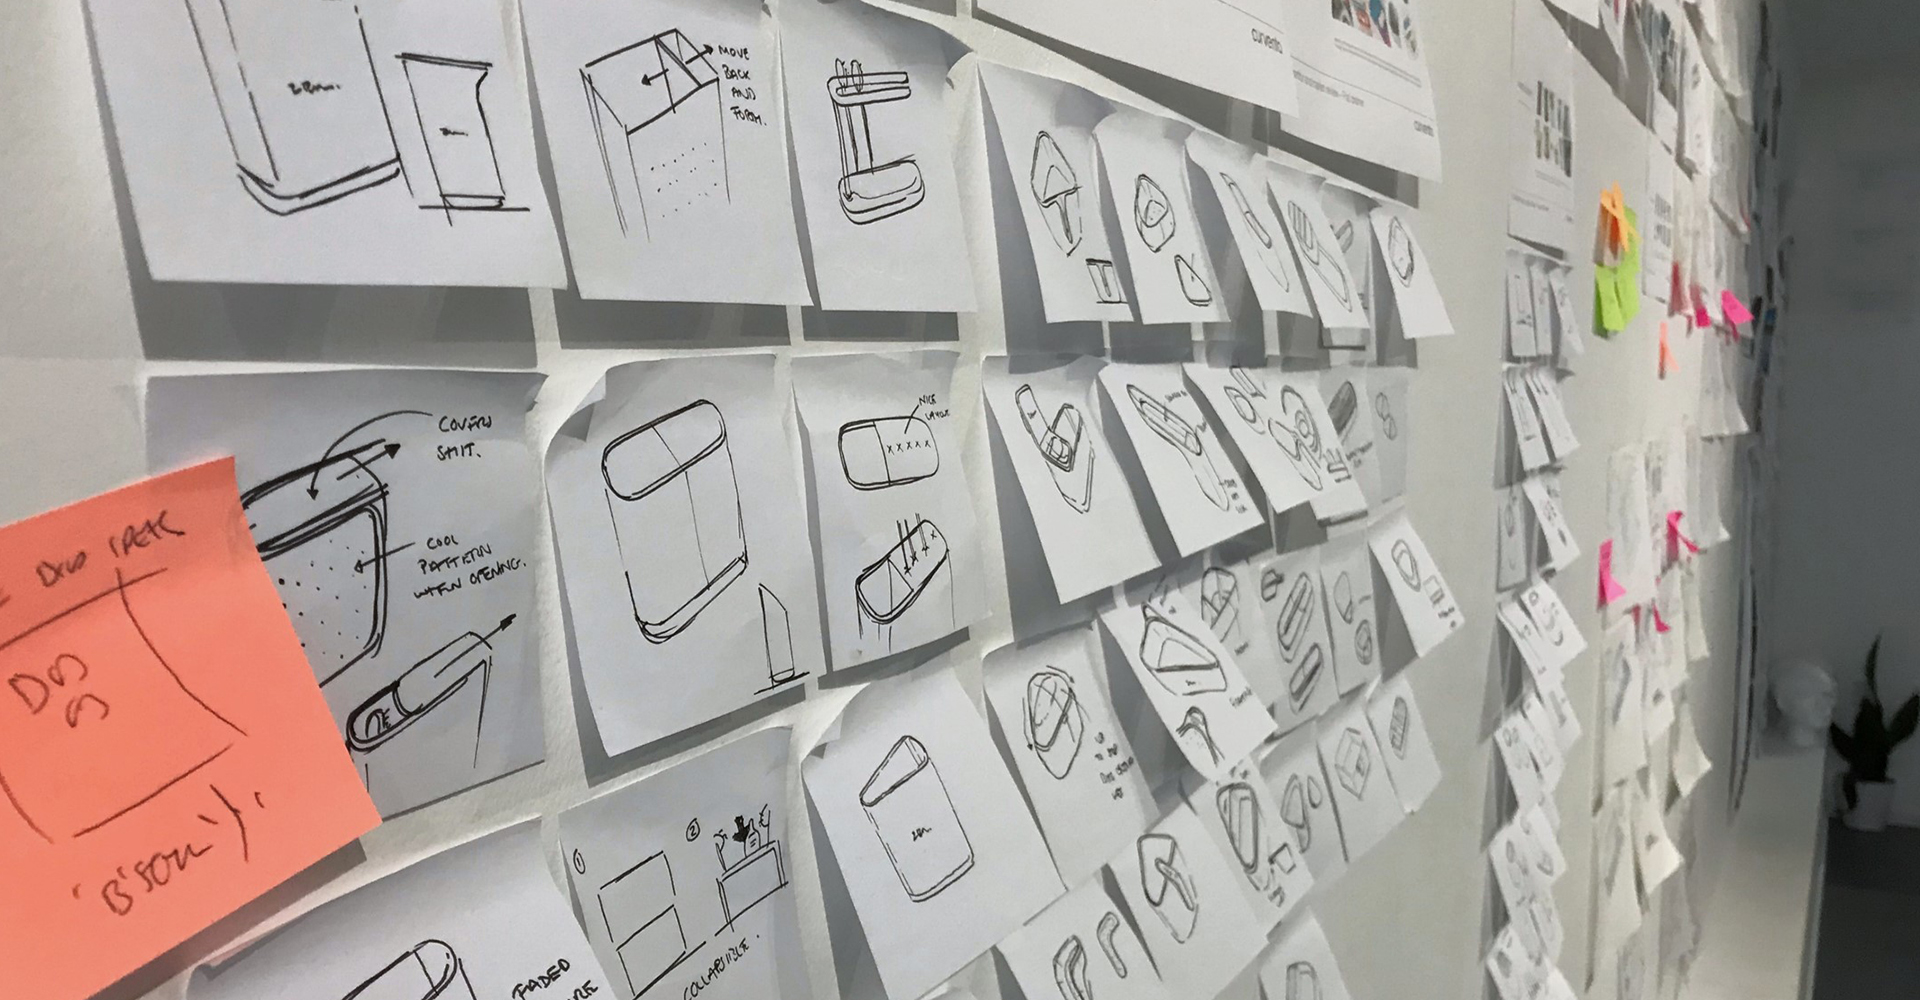 CKS Zeal 2018 range| Initial brainstorm